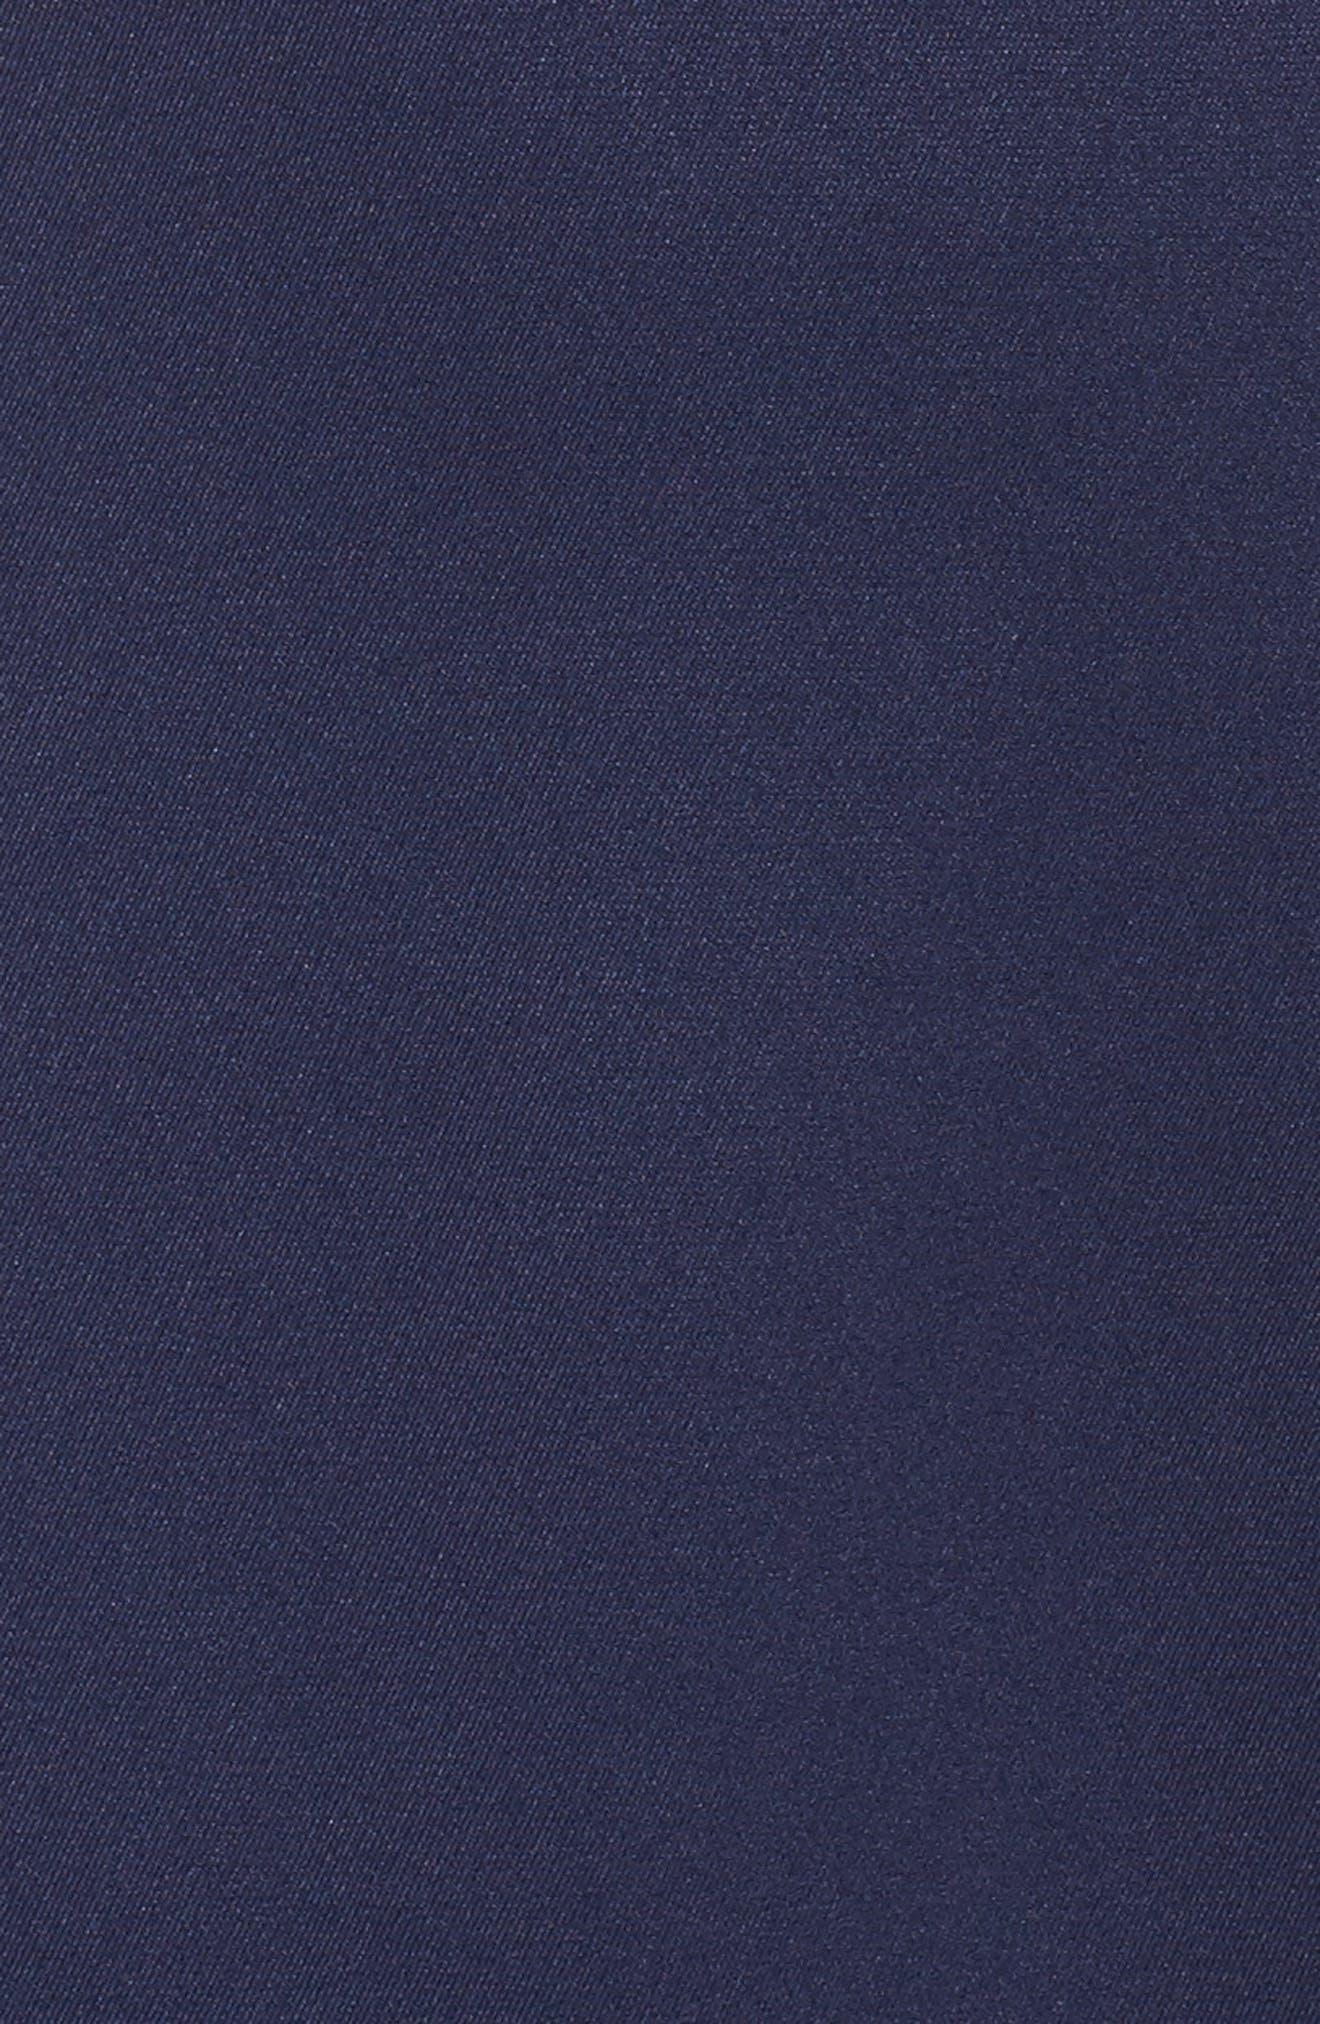 Dove Drift Ruffle Dress,                             Alternate thumbnail 5, color,                             400